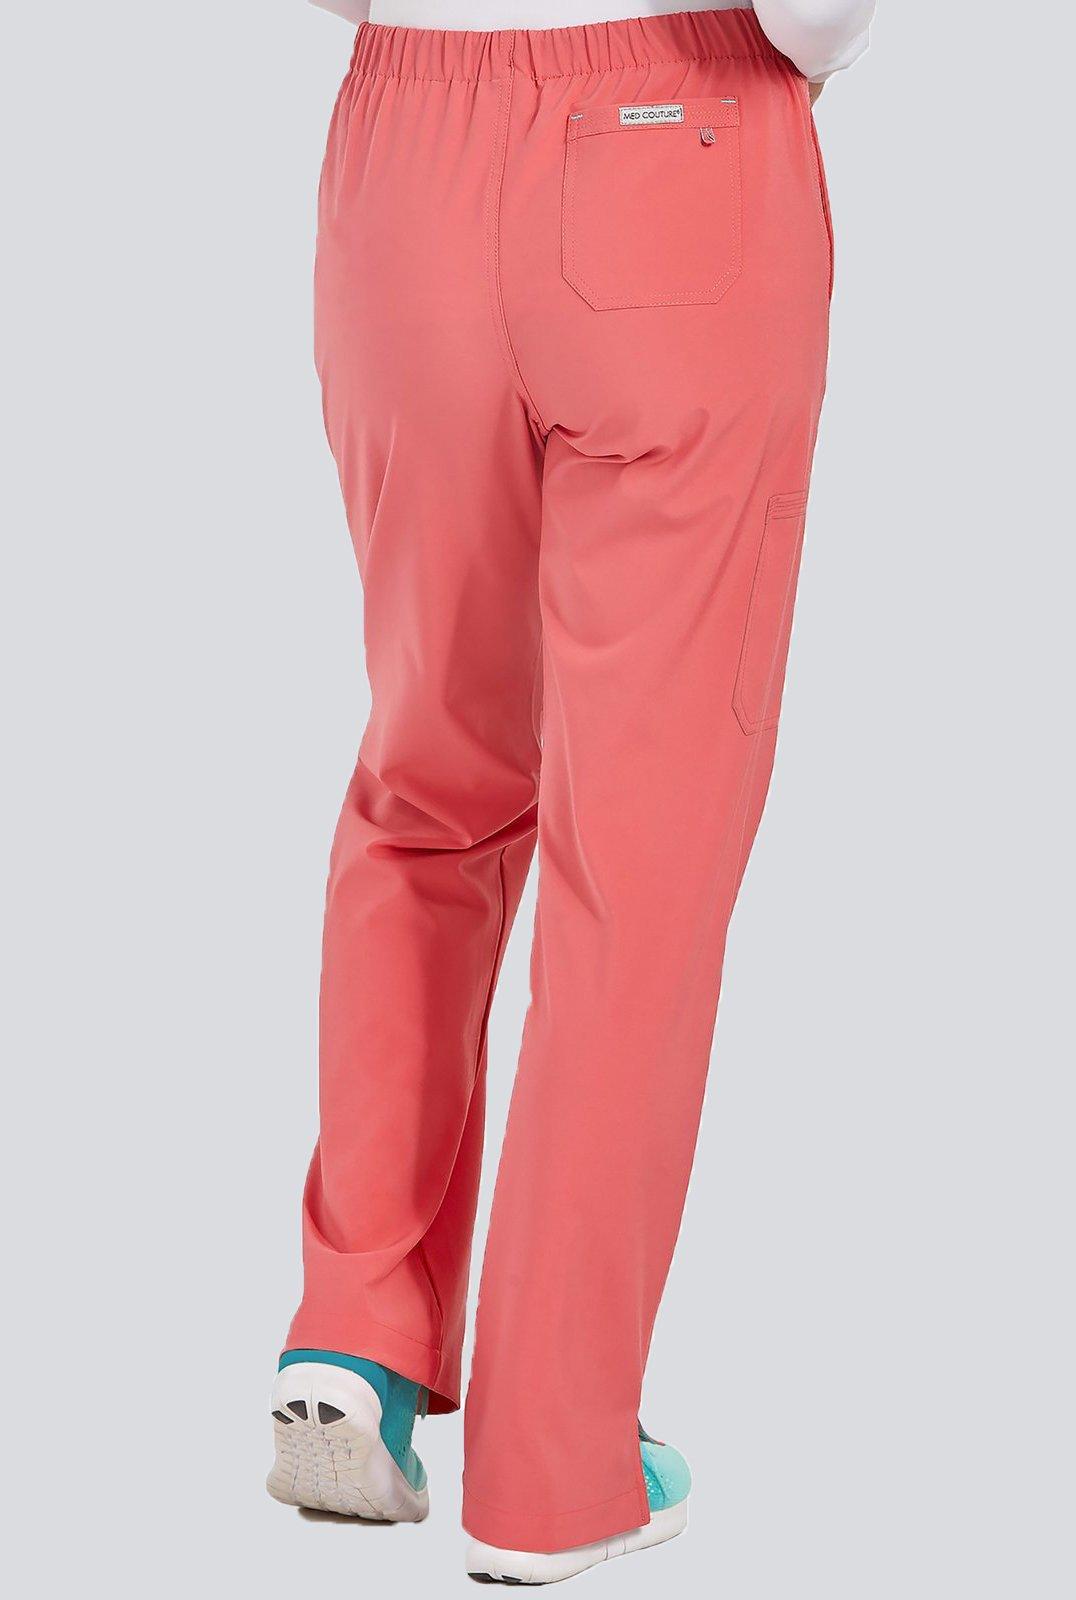 64787c97 Spodnie medyczne damskie Med Couture PERFORMANCE ENERGY STRETCH 8719-CRAL